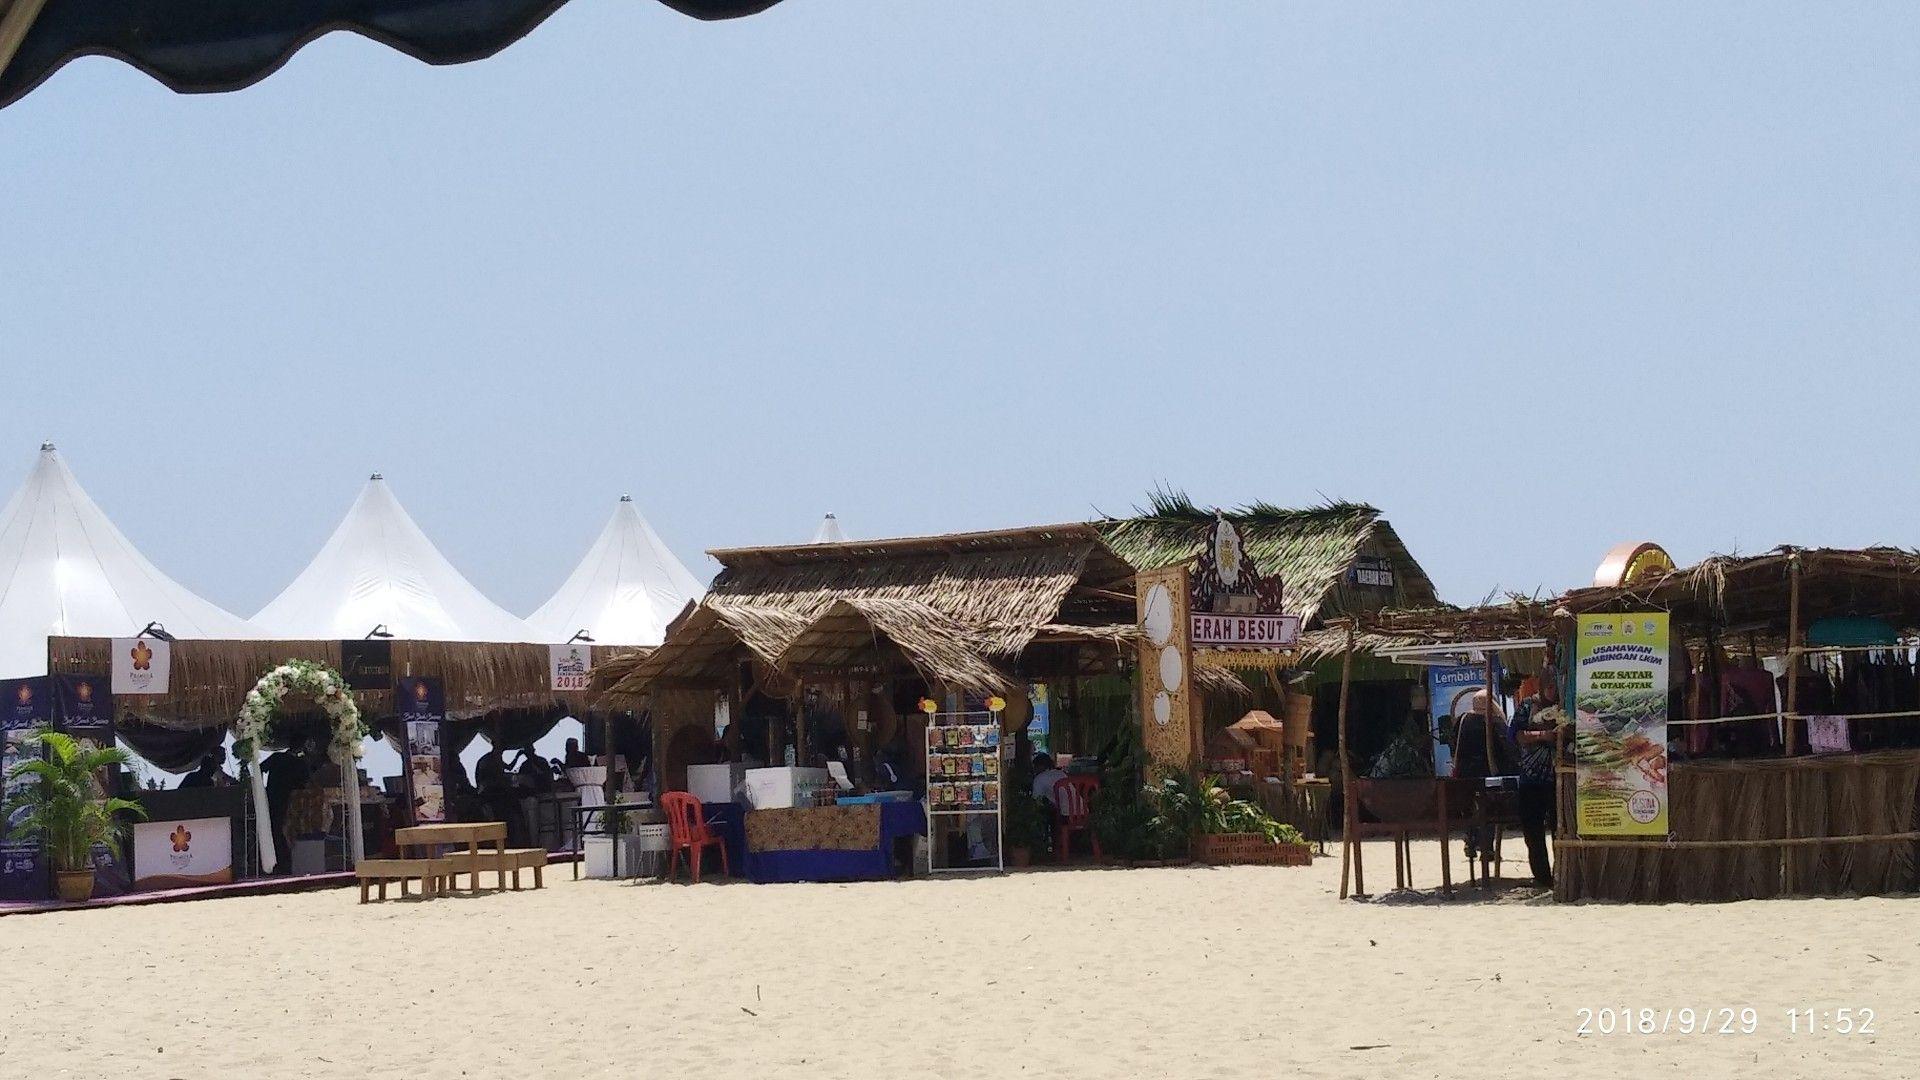 Pesta Pantai Batu Burok Patio Patio Umbrella Outdoor Decor - Pesta Pantai, Pesta Pantai Pariaman Tahun 2019 Kunjungan Wisatawan Meningkat Ekonomi Bergairah Posmetro Padang